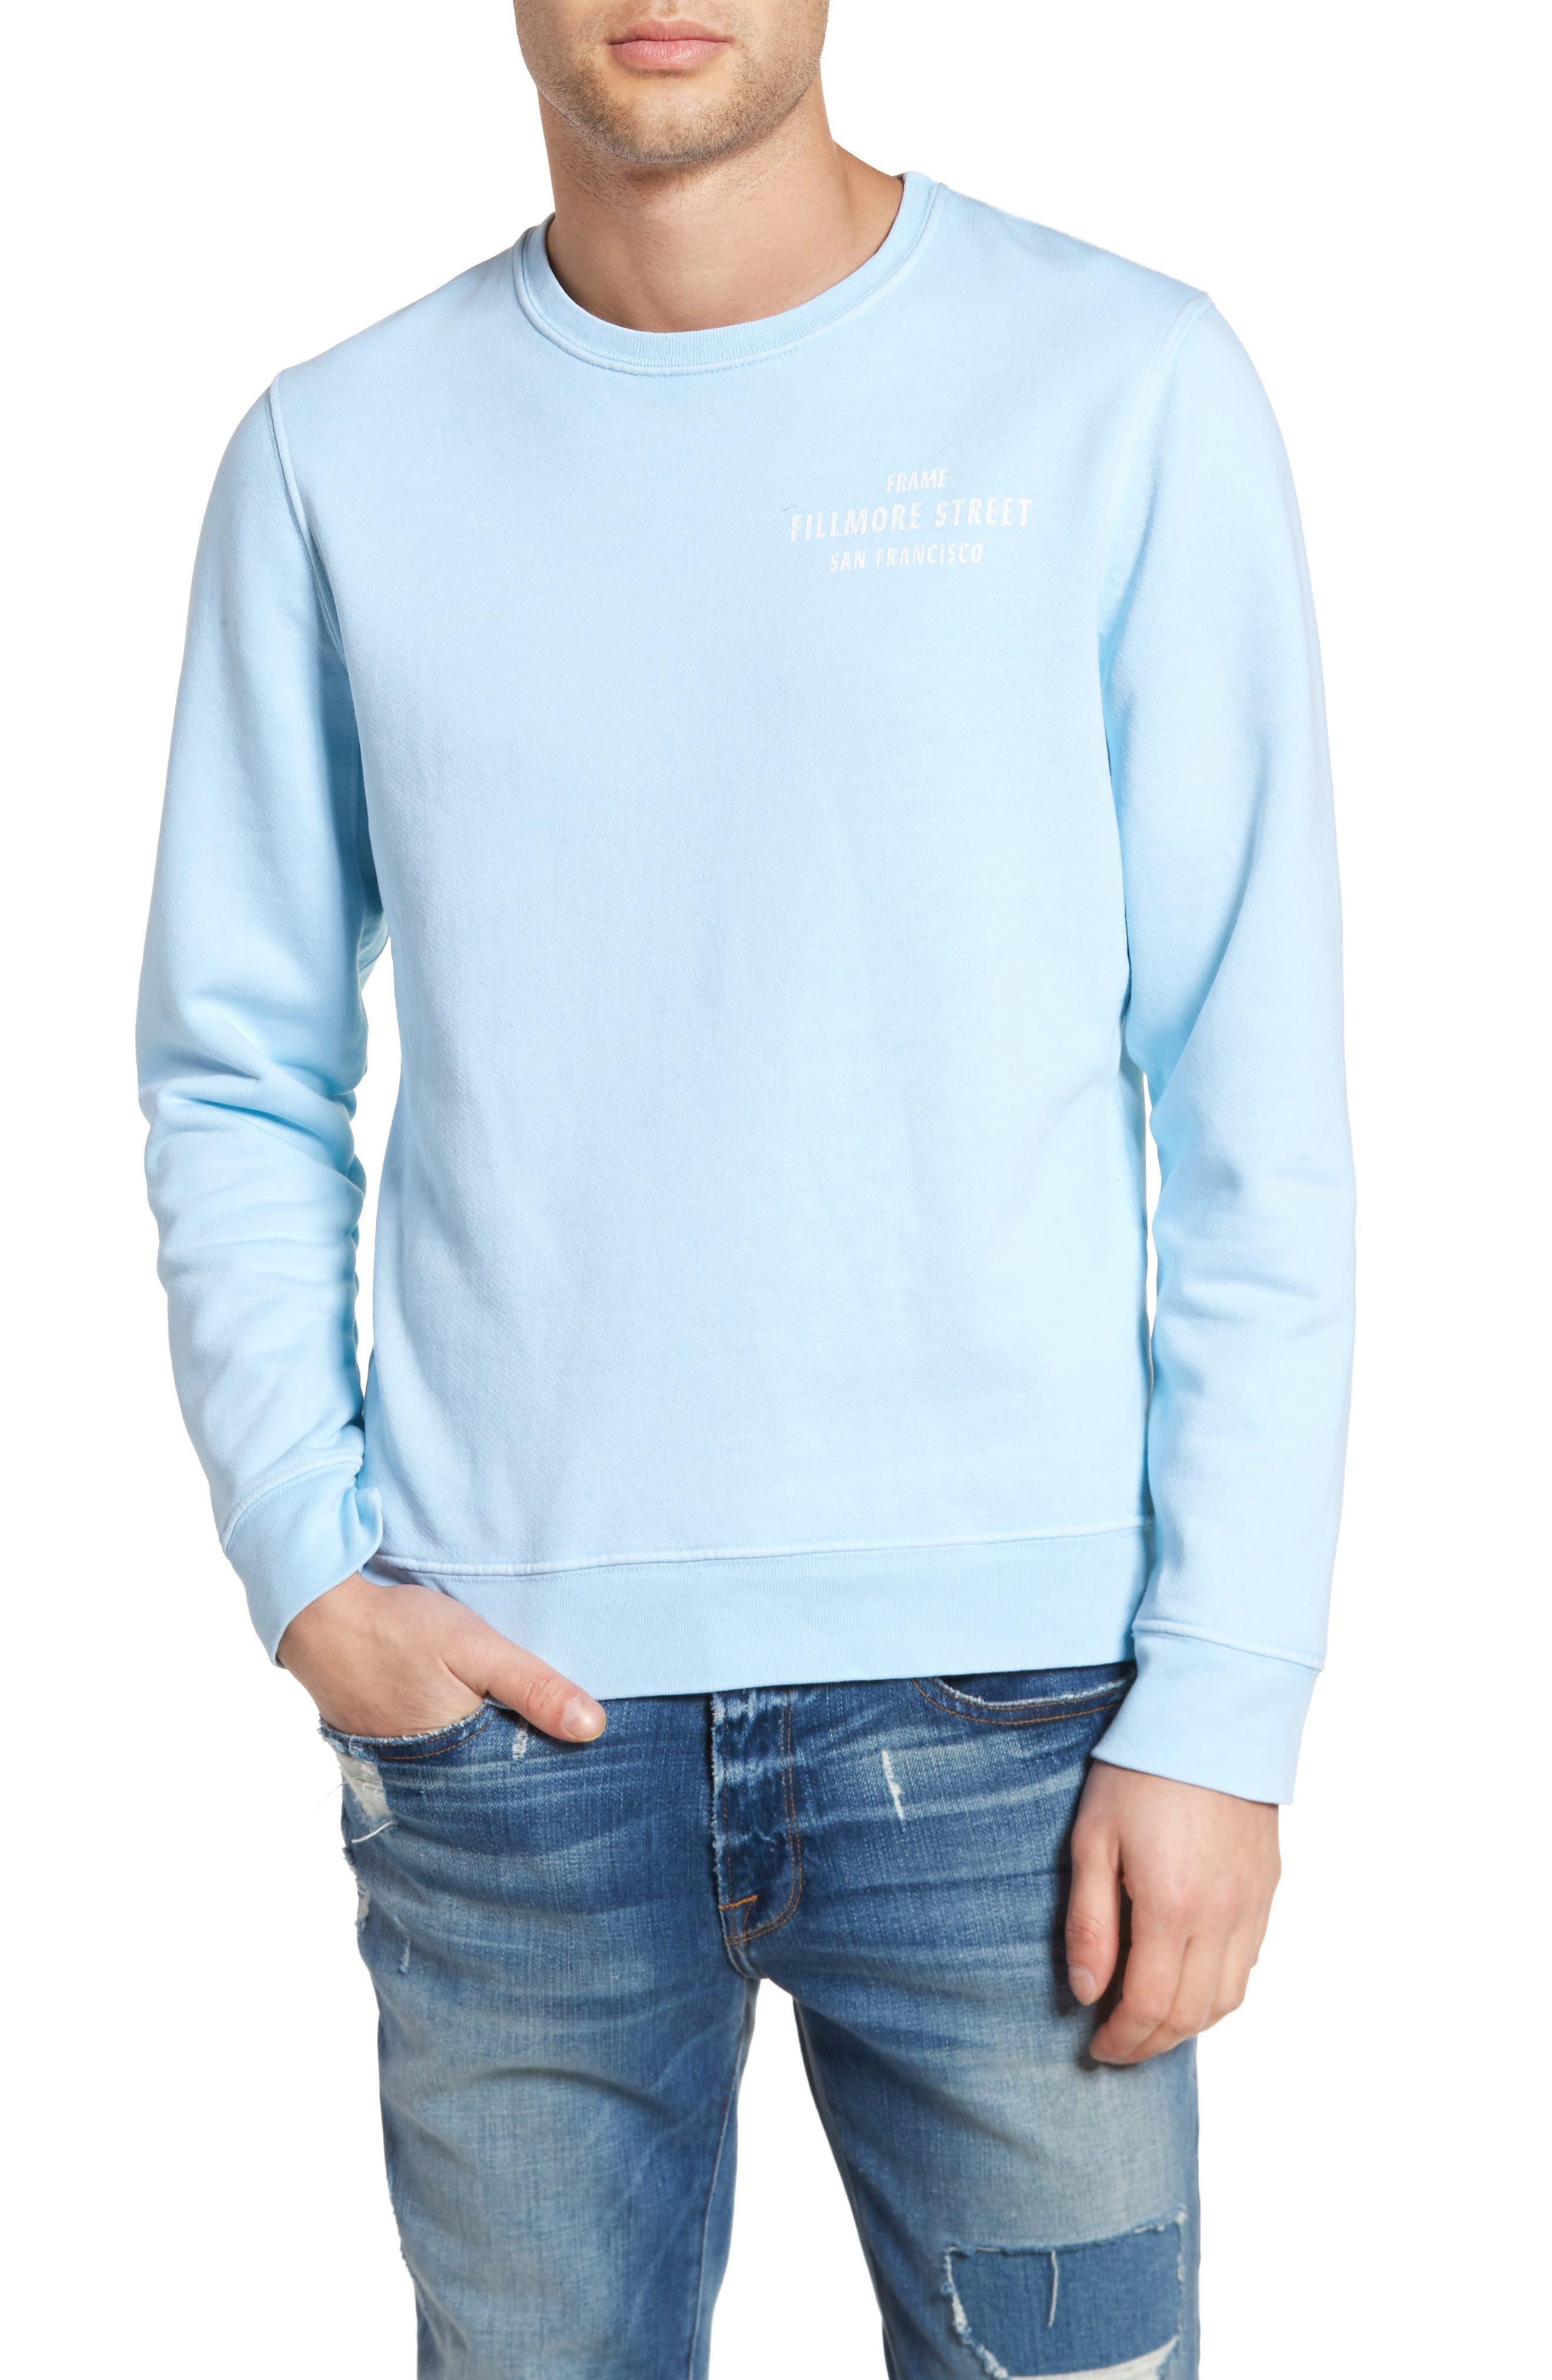 FRAME Vintage Crewneck Sweatshirt